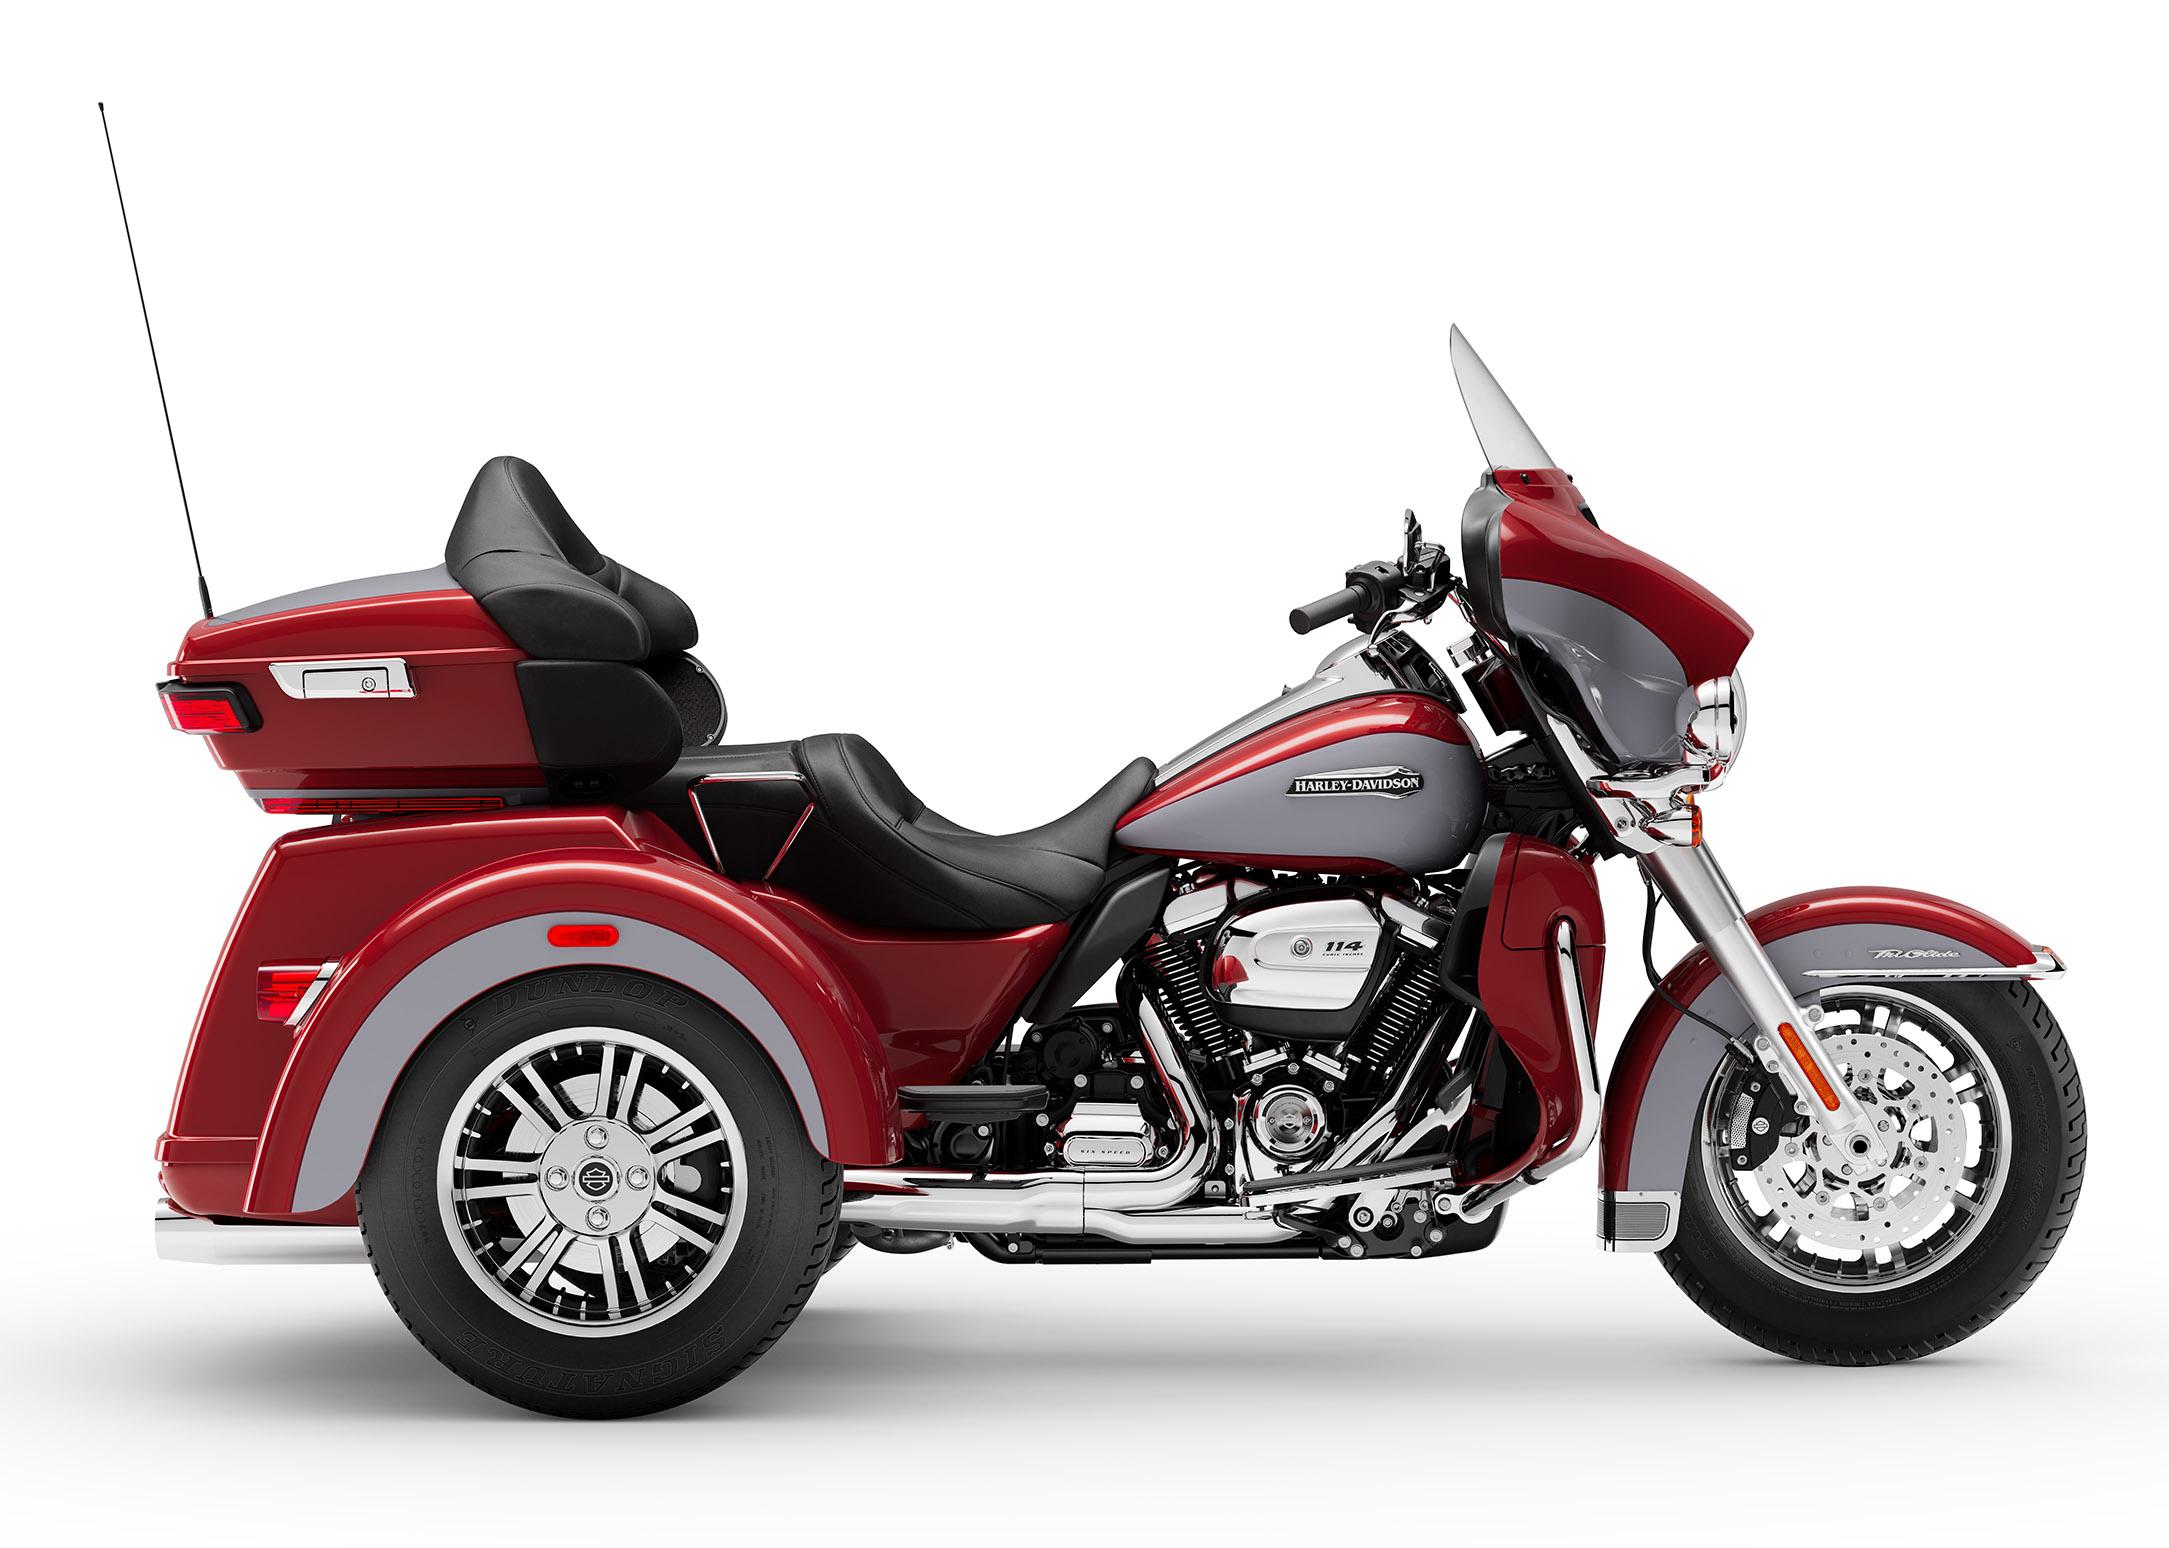 2019 Harley-Davidson Tri Glide Ultra